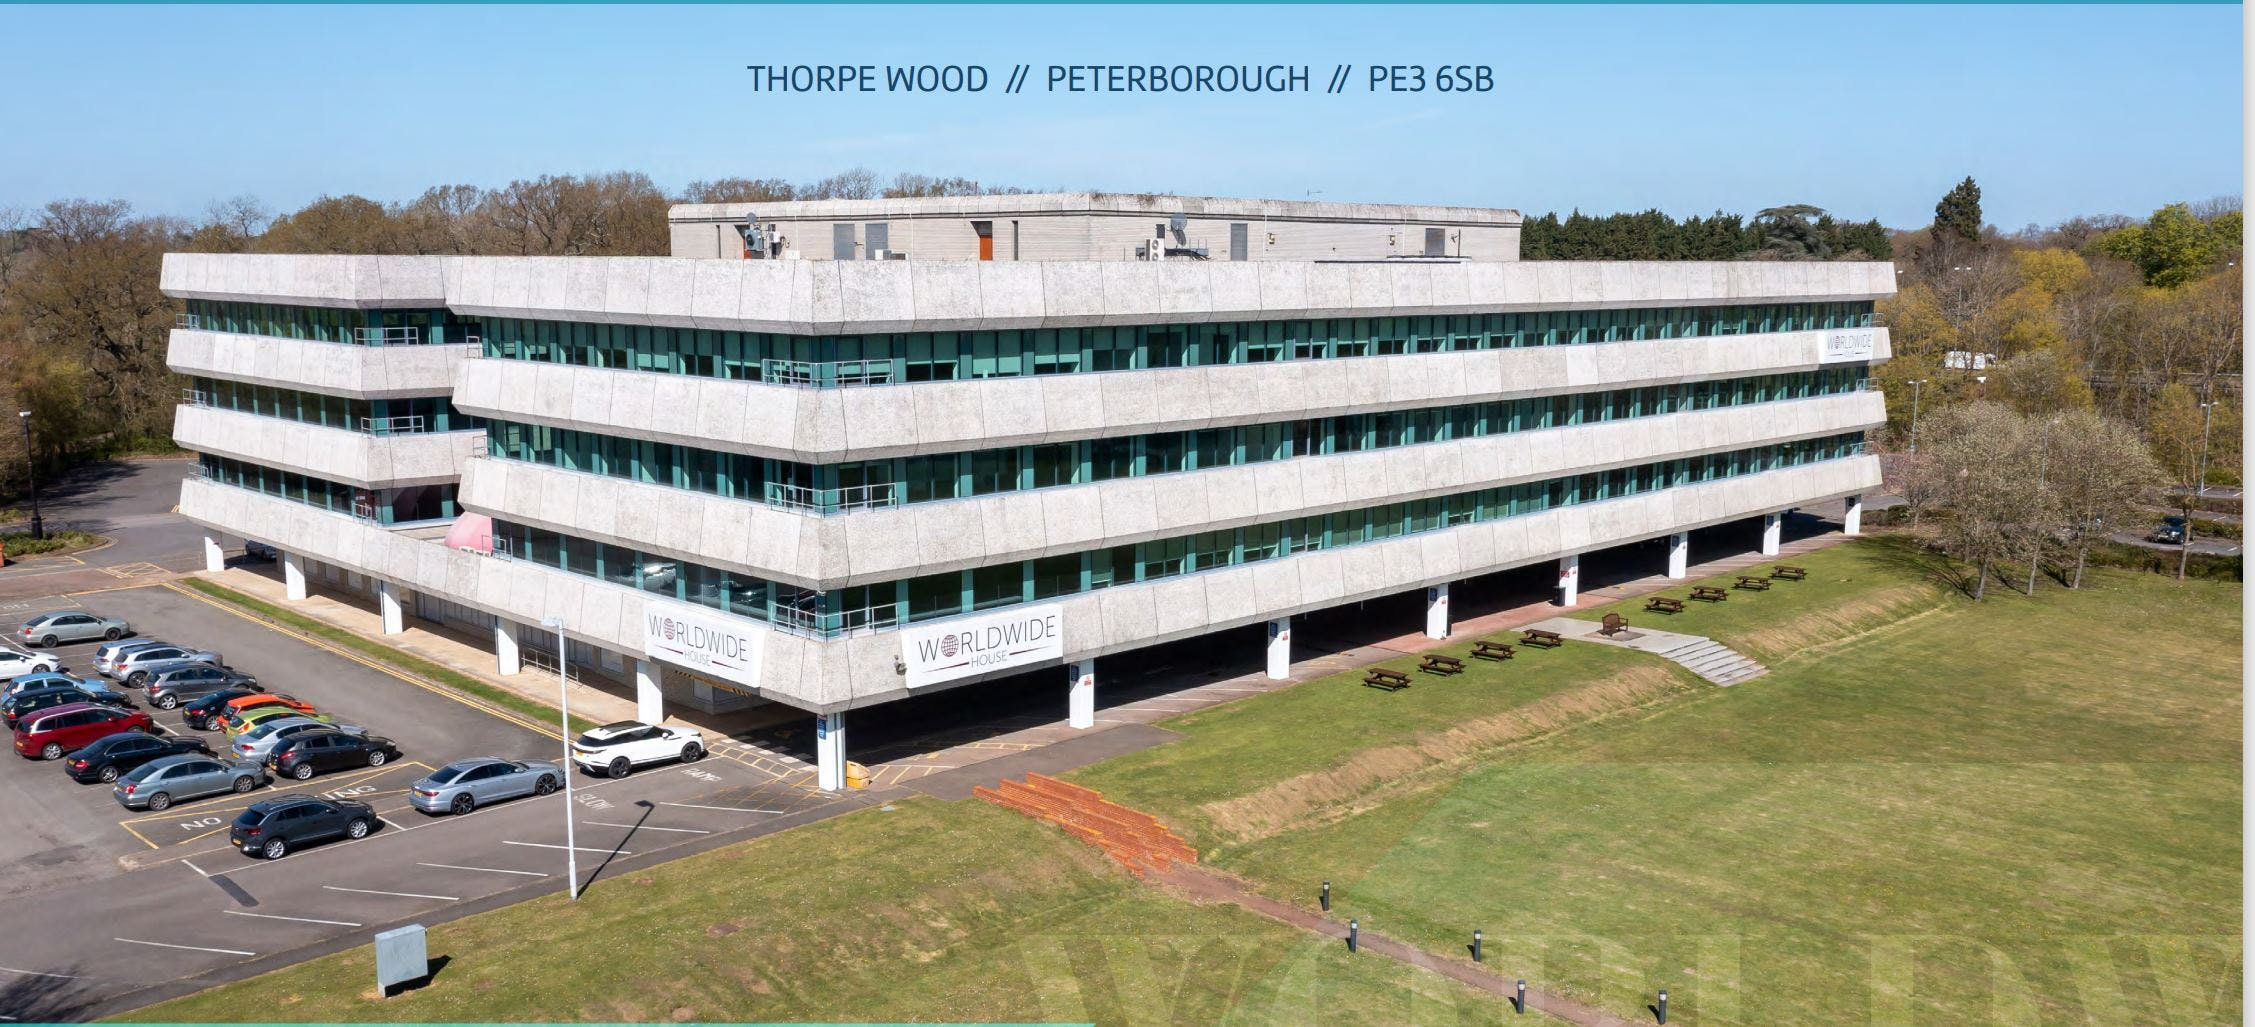 Worldwide House, Thorpe Wood, Peterborough, Office To Let - Drone footage of externals.JPG